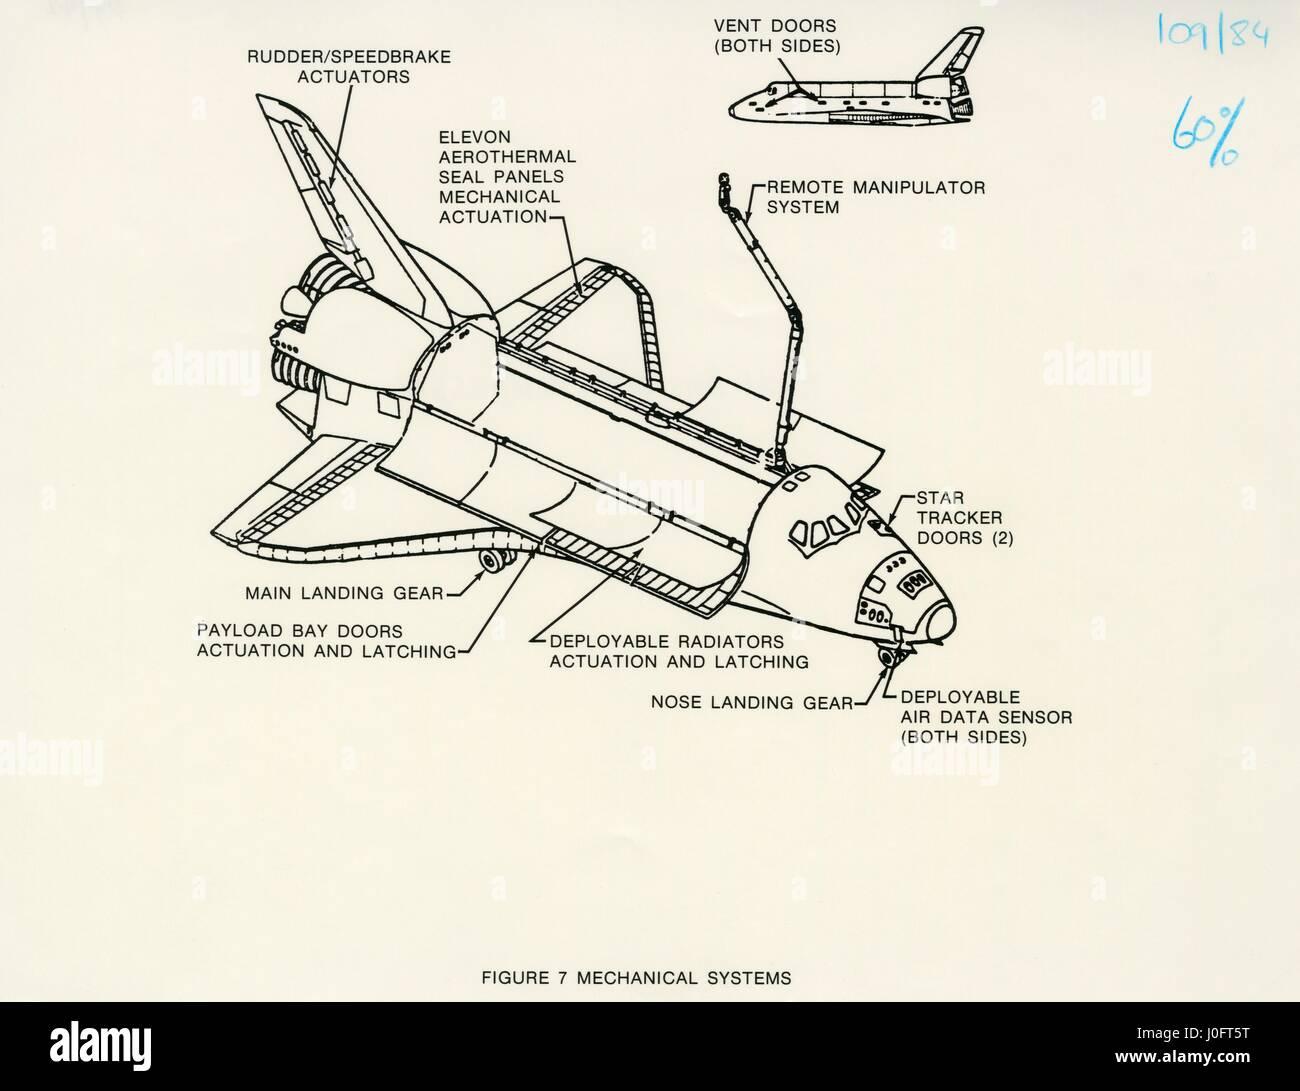 Space Shuttle Diagram Stockfotos & Space Shuttle Diagram Bilder - Alamy